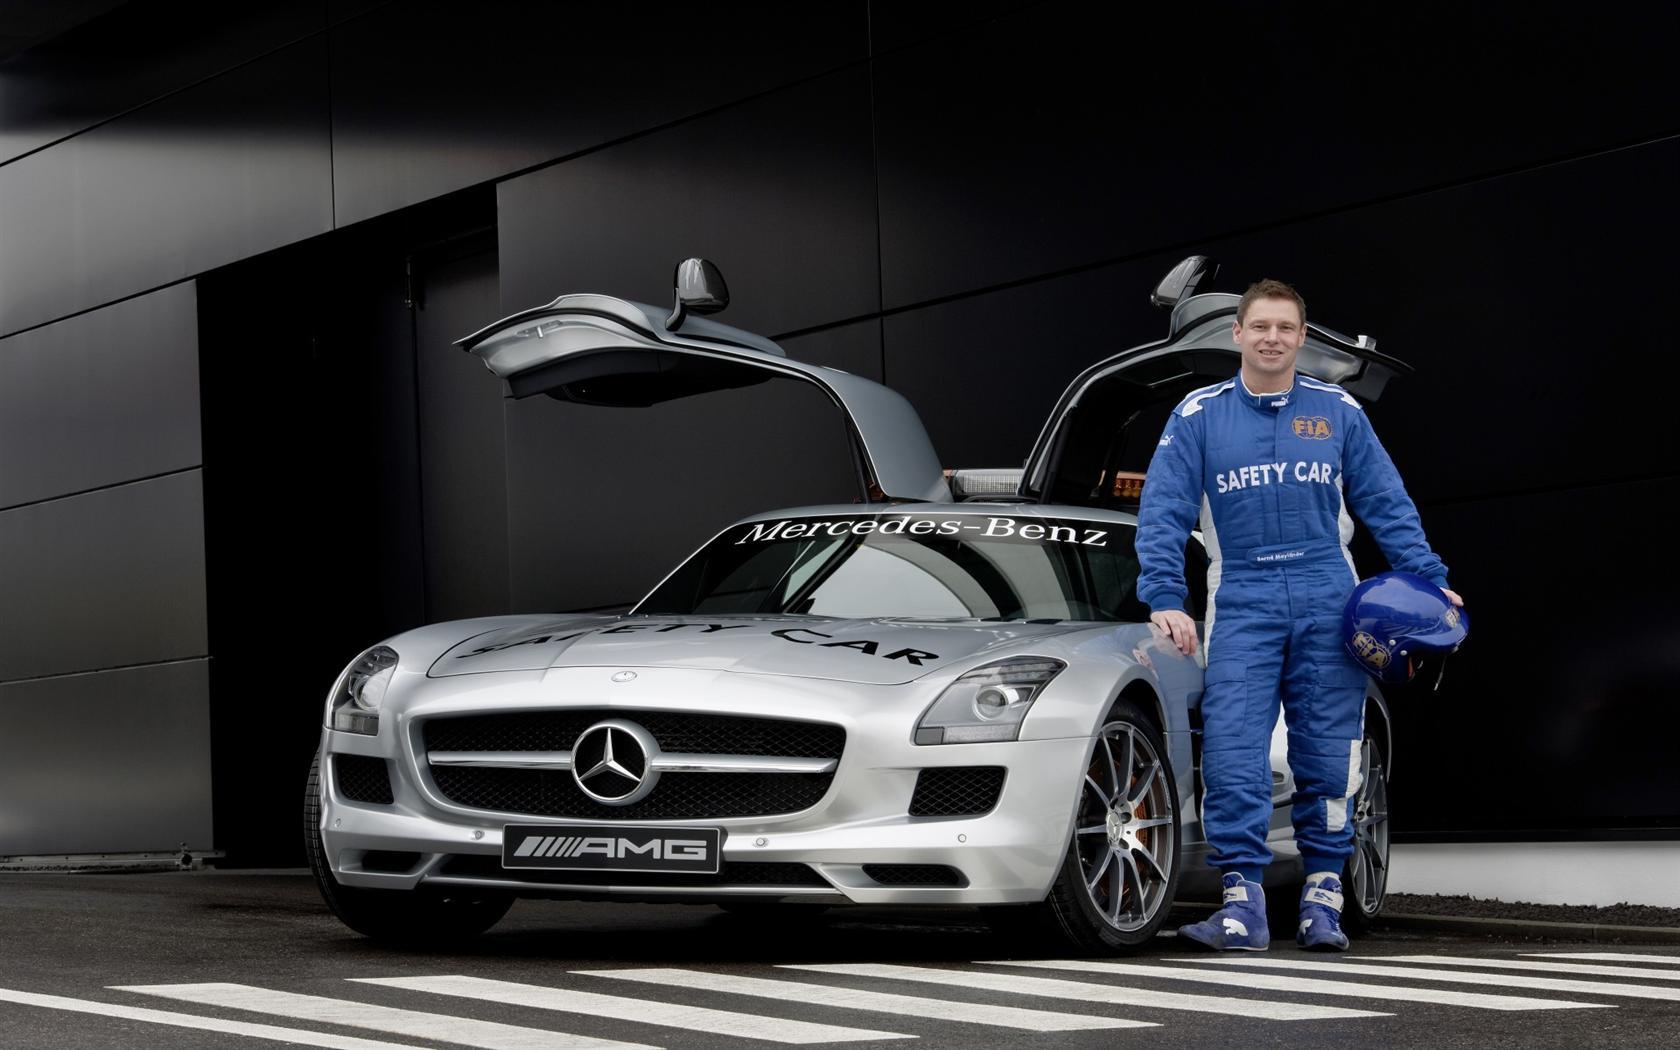 Mercedes-Benz Safety car скачать